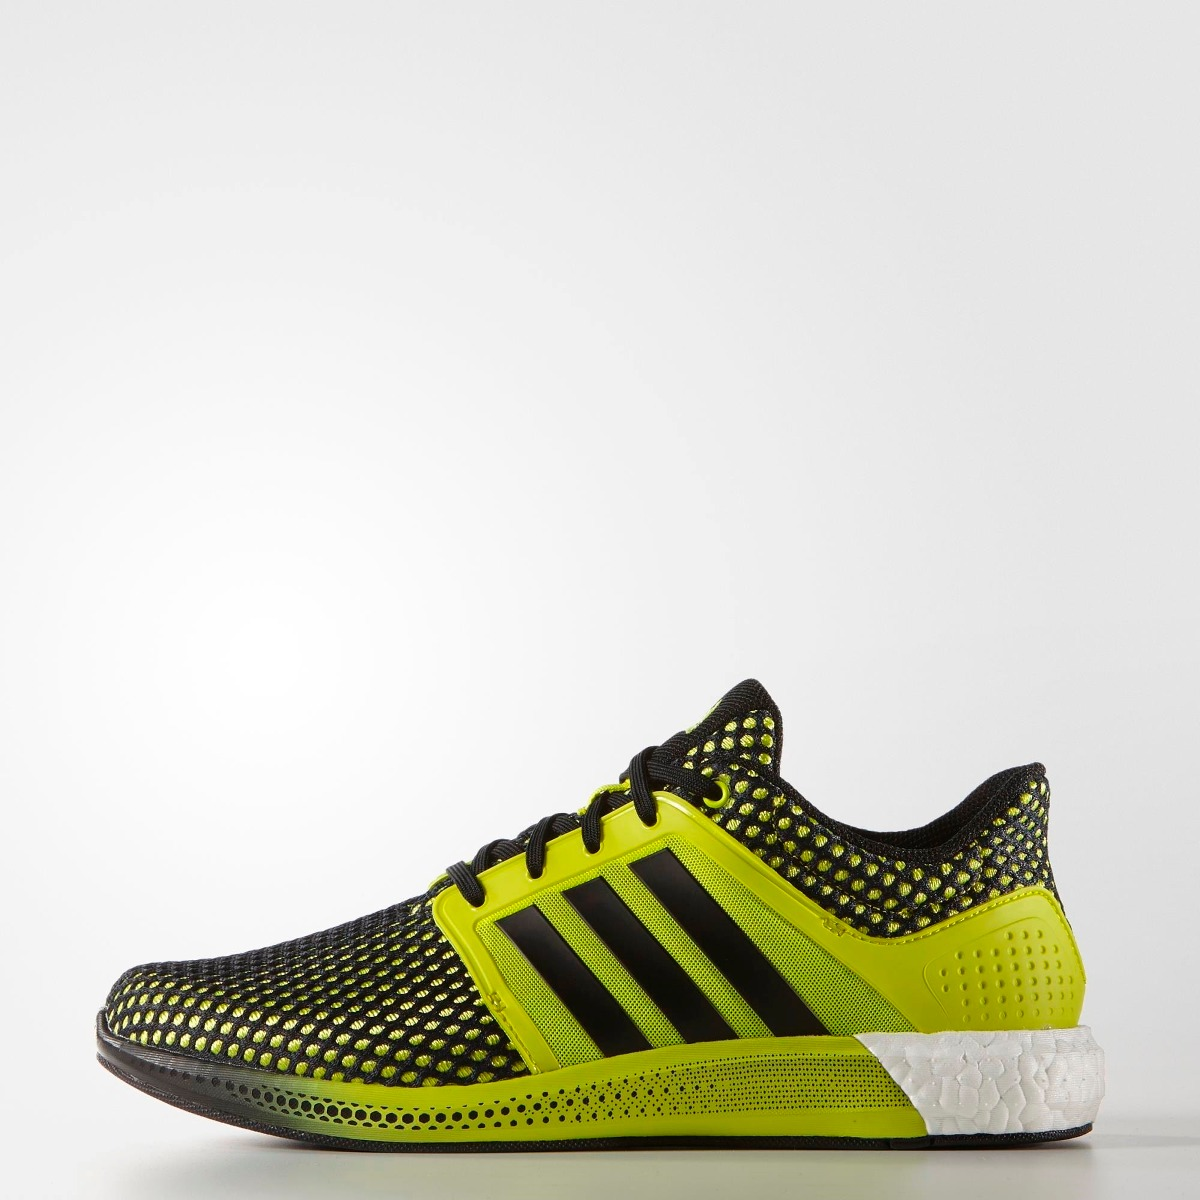 53352497751 ... clearance tenis adidas solar boost m net mesh corrida run. carregando  zoom. 88914 408a1